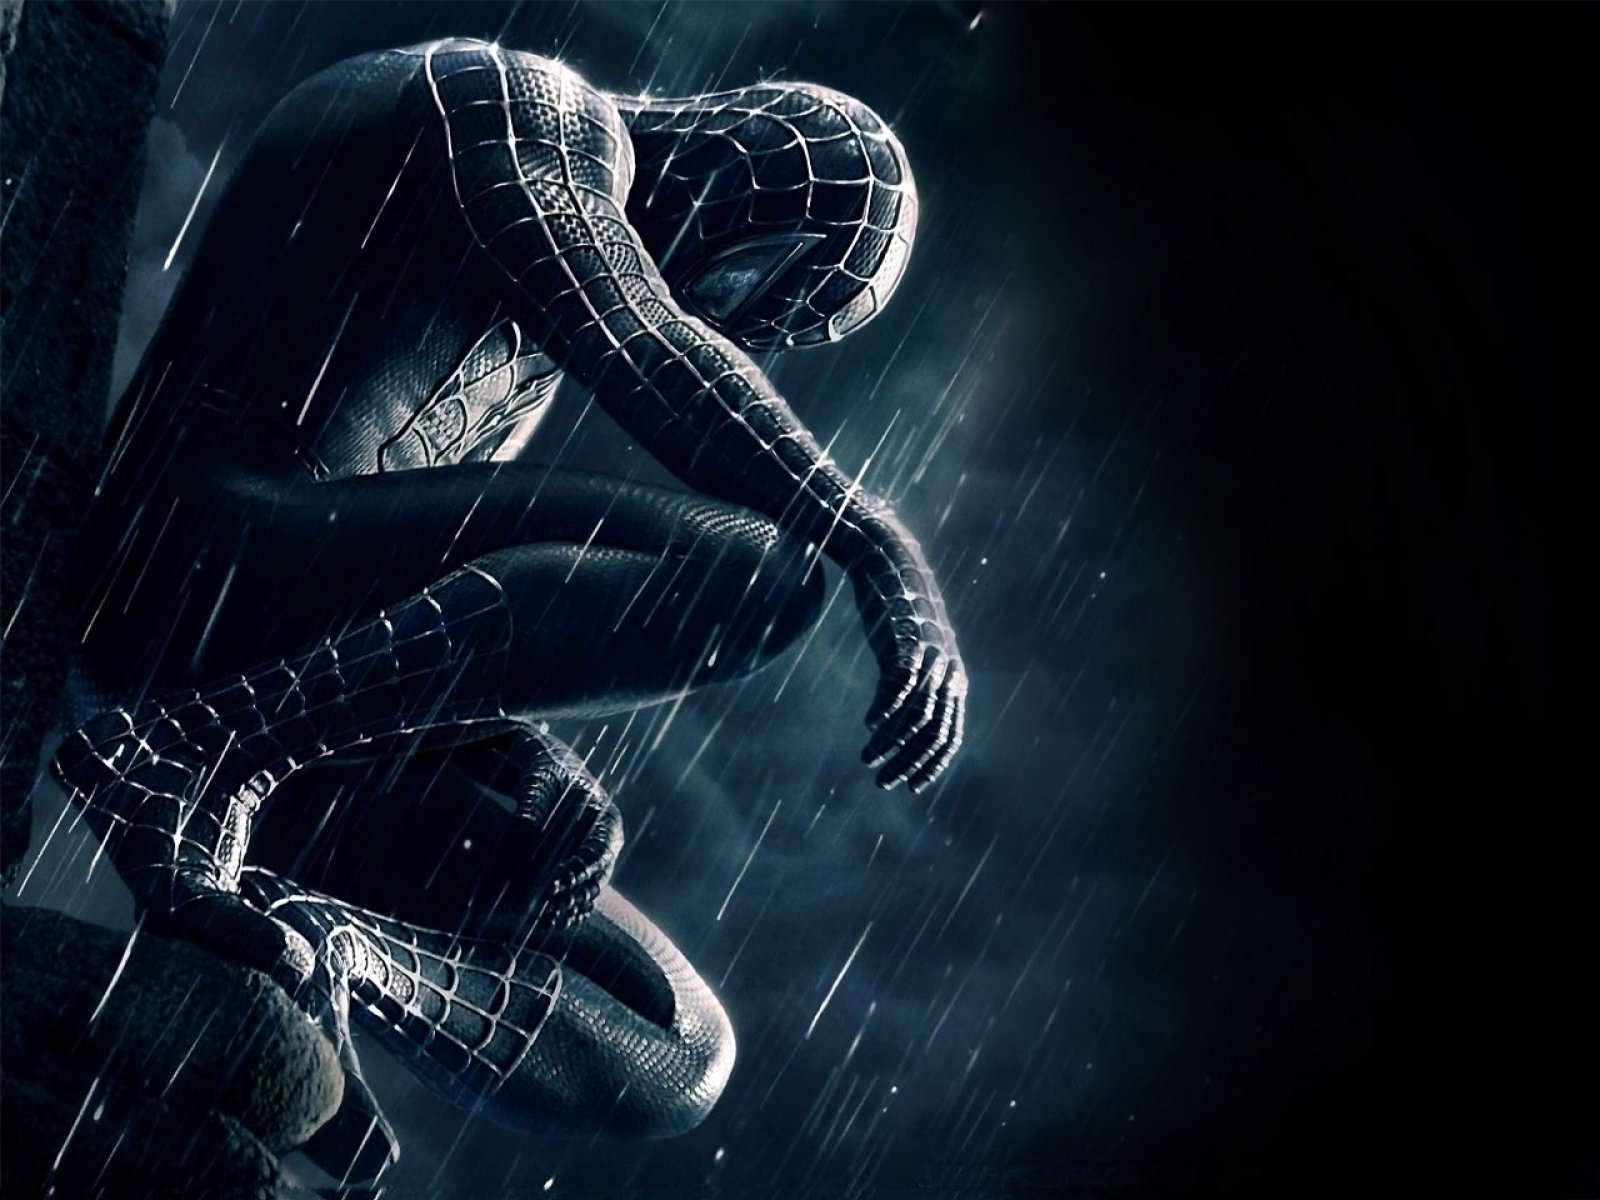 black spiderman wallpaper,cg artwork,fictional character,organism,illustration,space